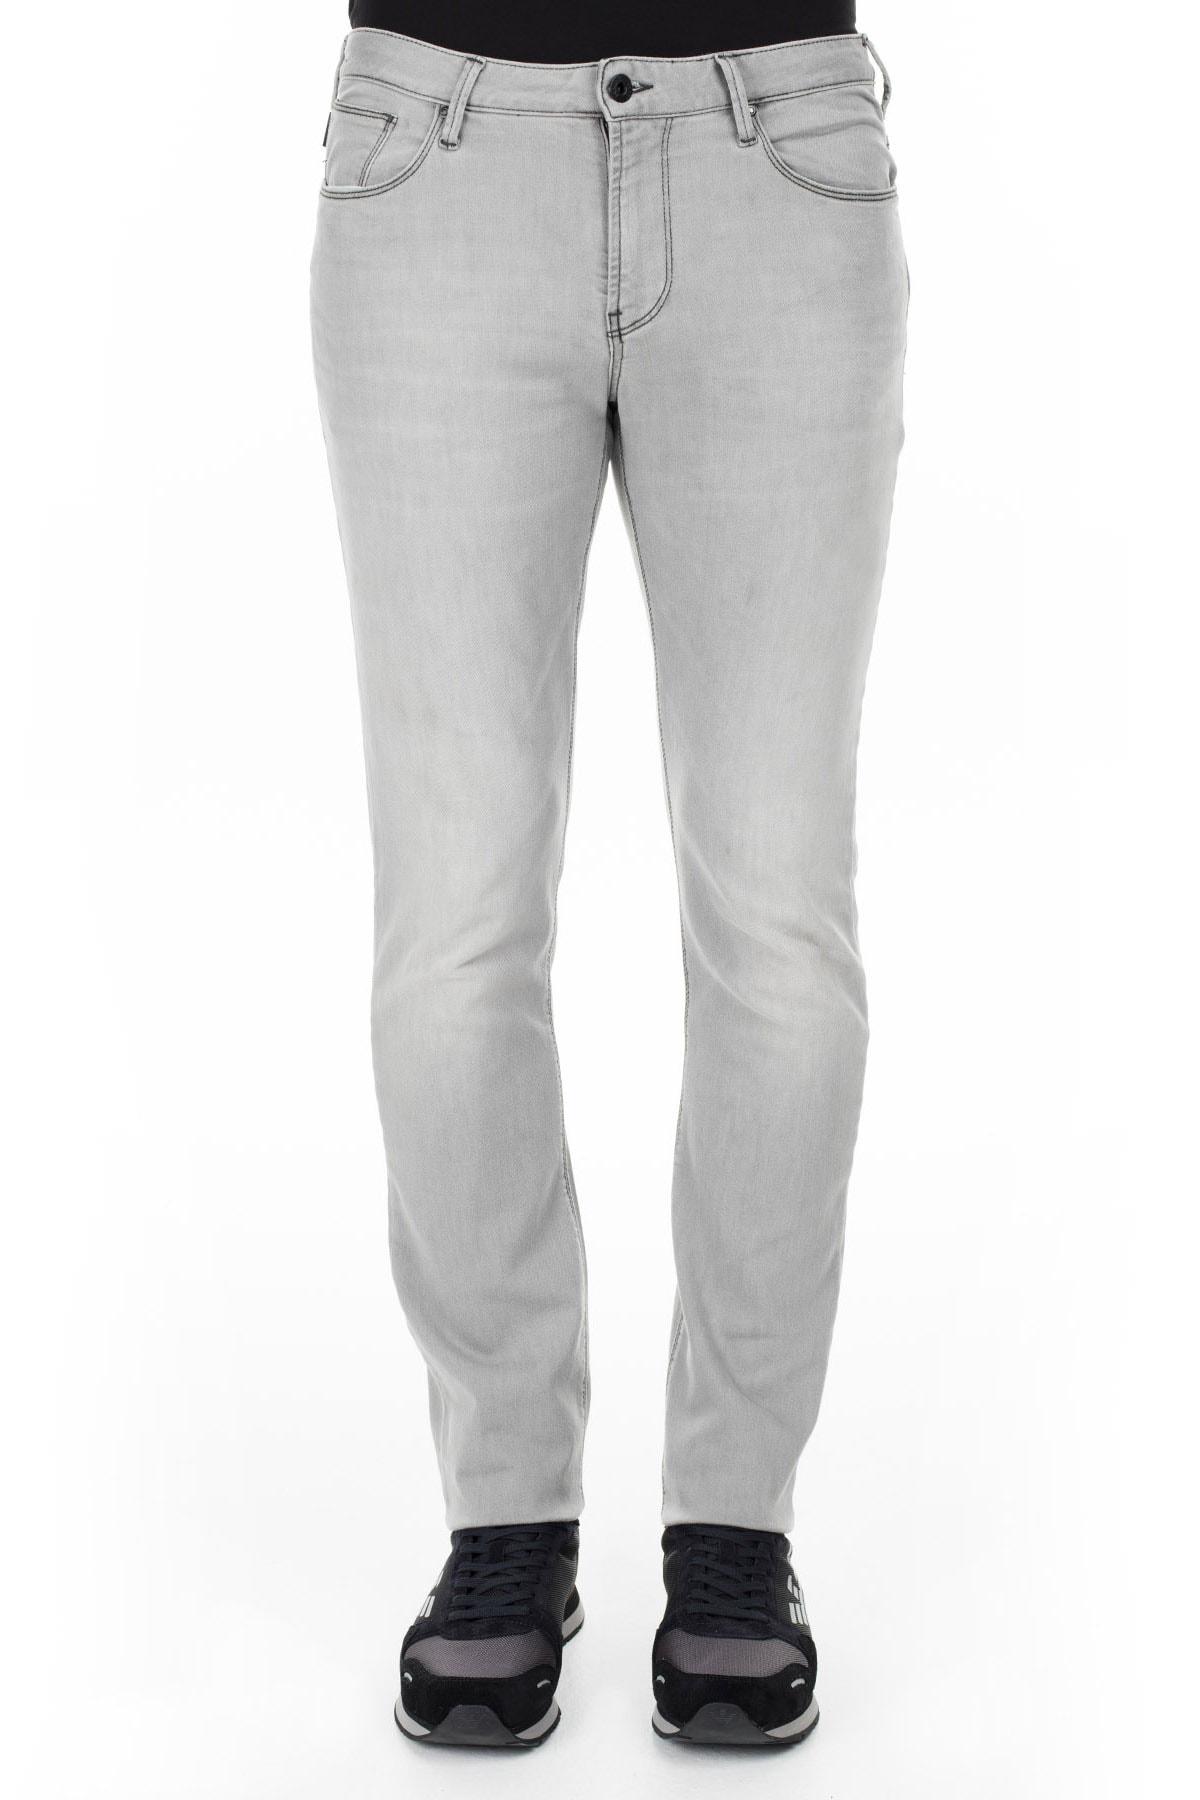 Armani Jeans Erkek PANTOLON 2